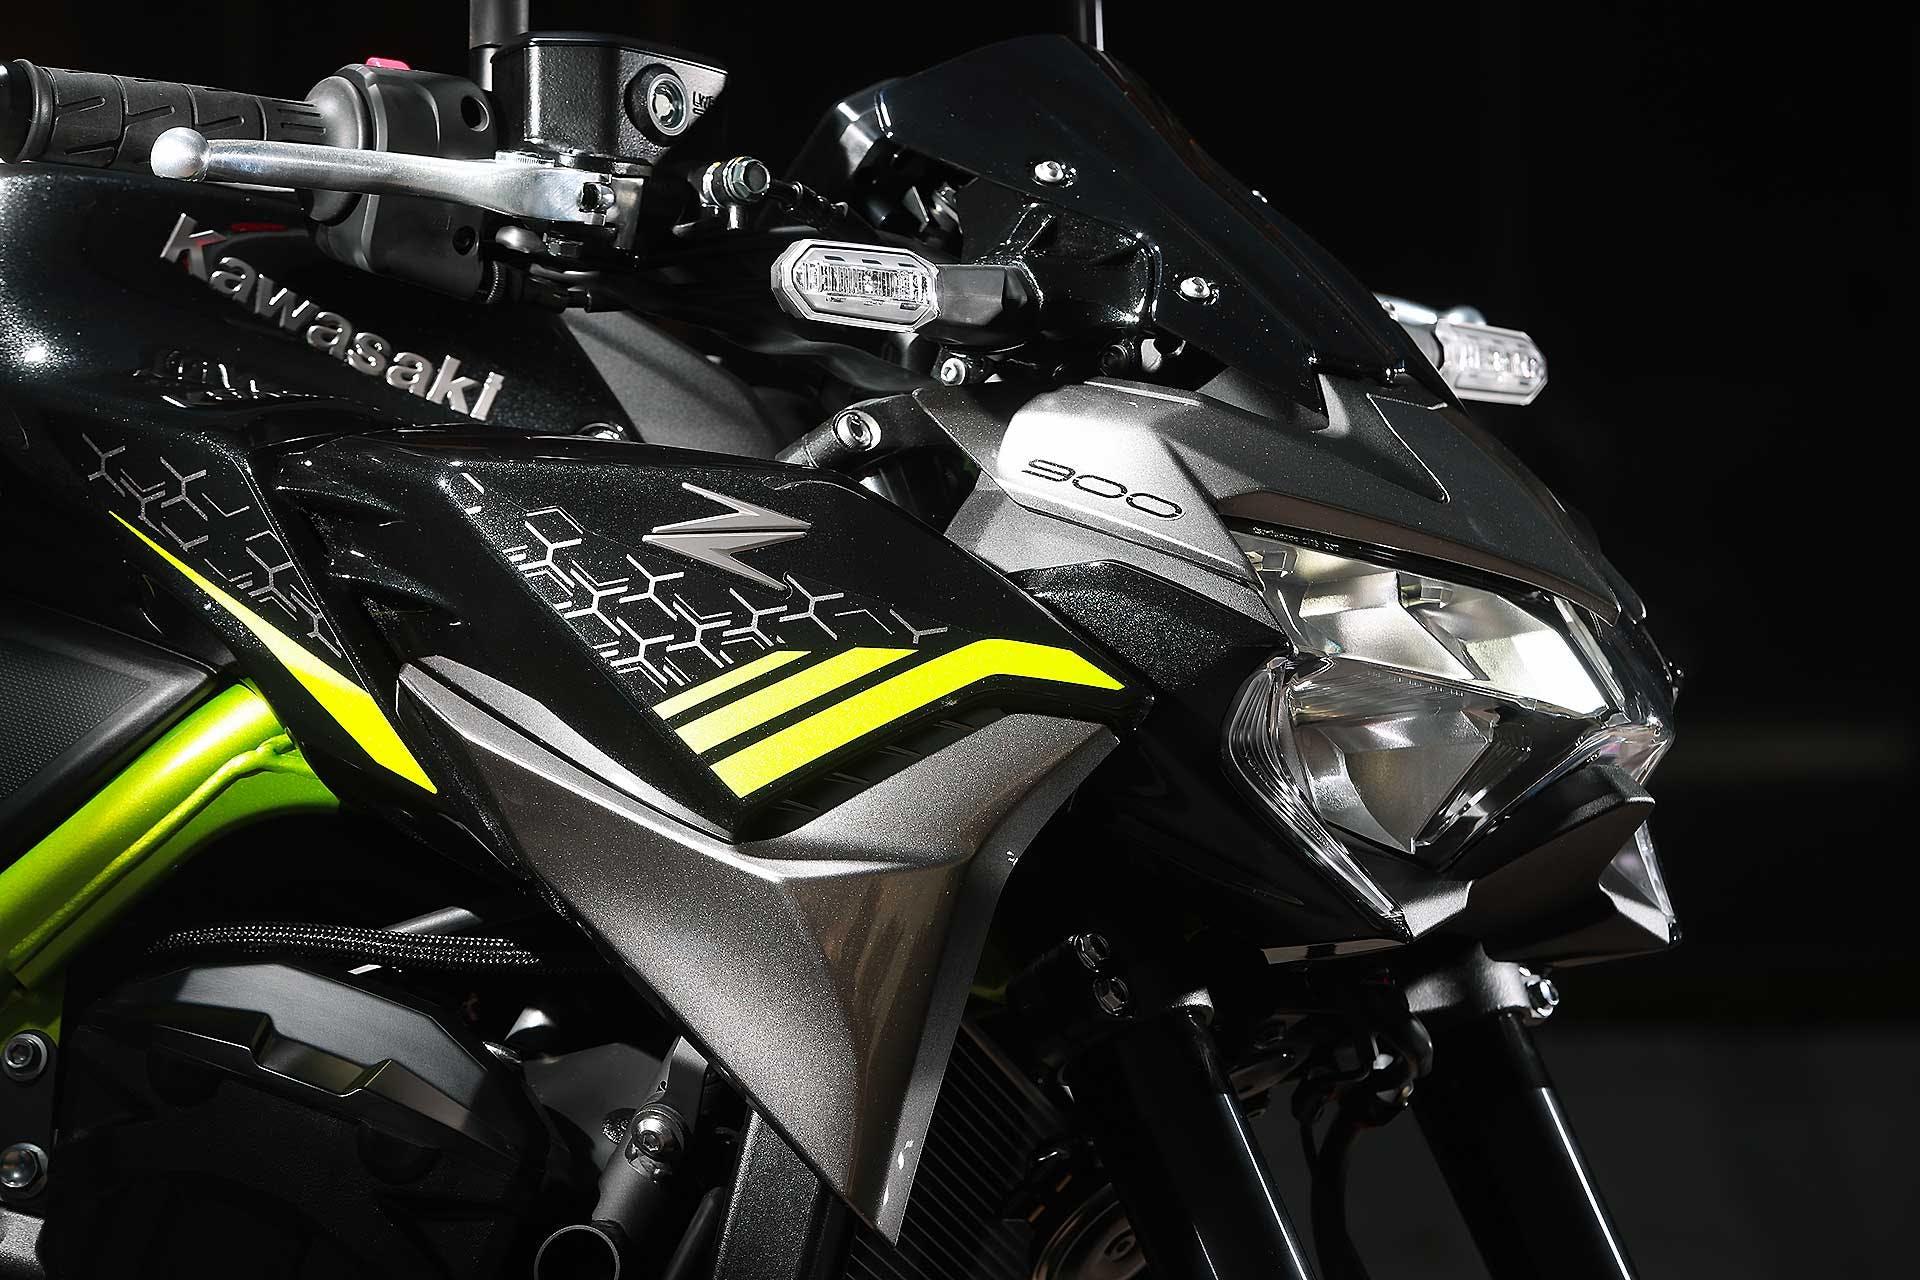 Prova Kawasaki Z900 2020 dettaglio faro Sugomi style